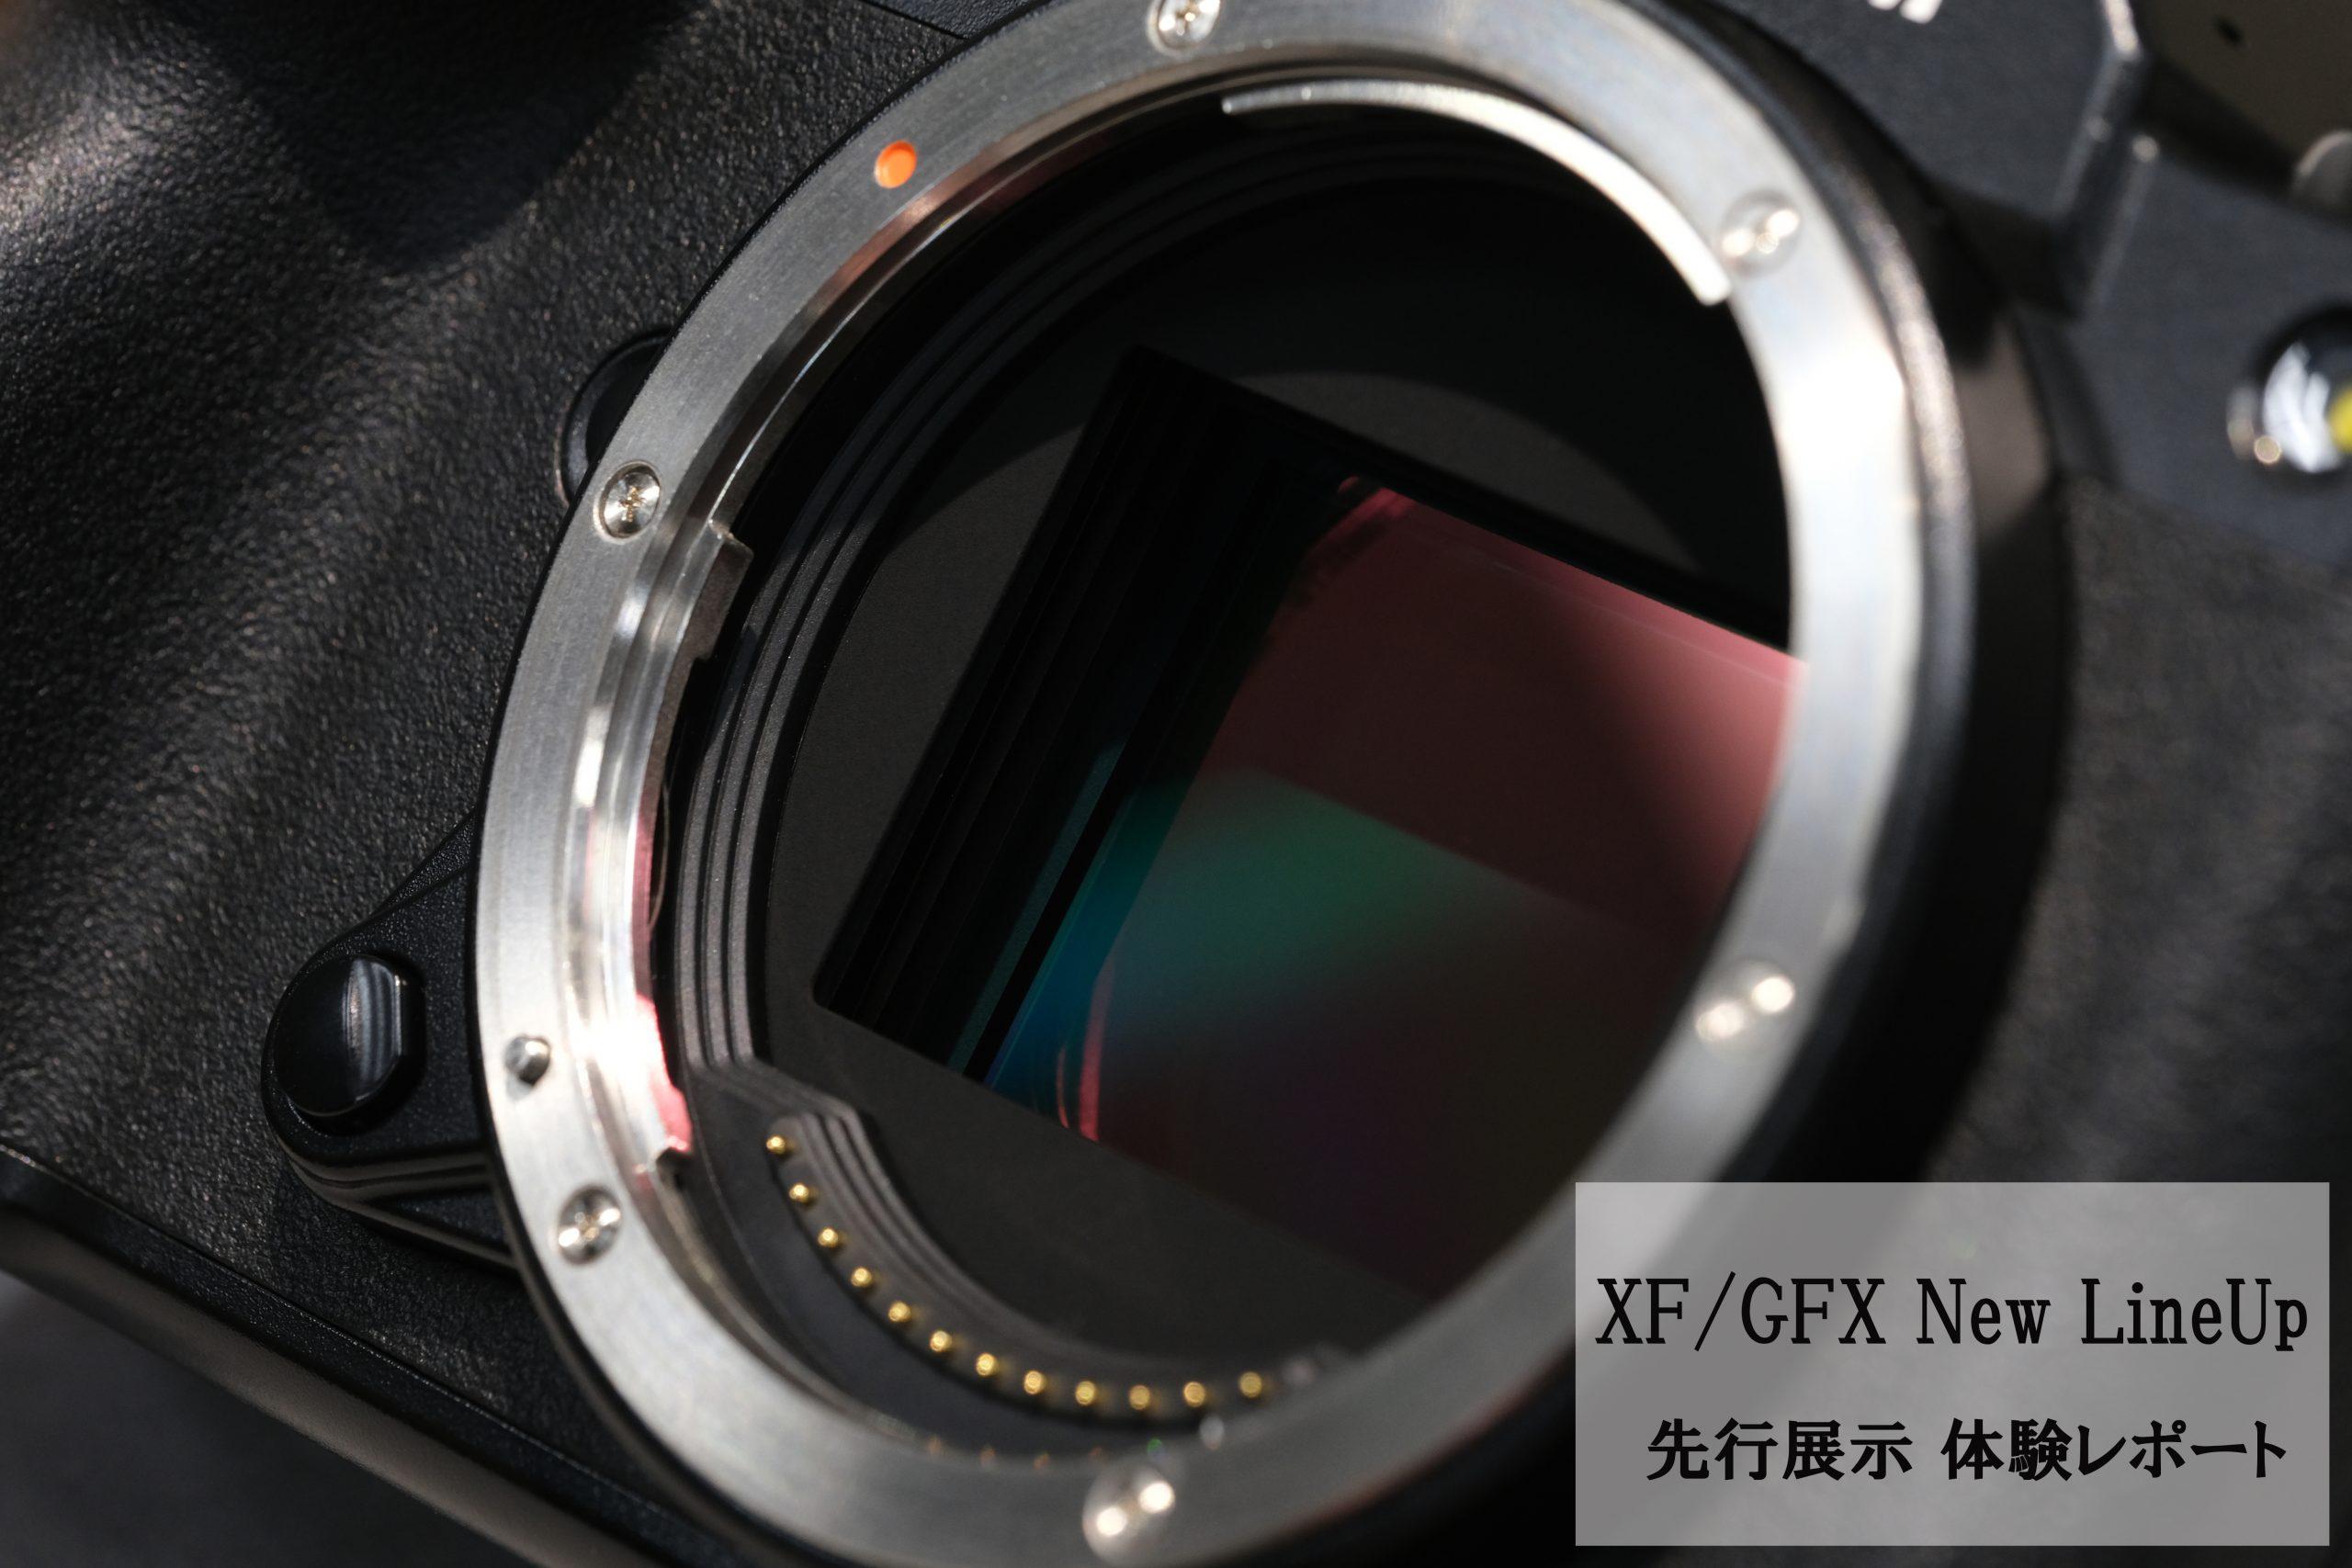 【FUJIFILM】XF/GFX New LineUp 先行展示 体験レポート